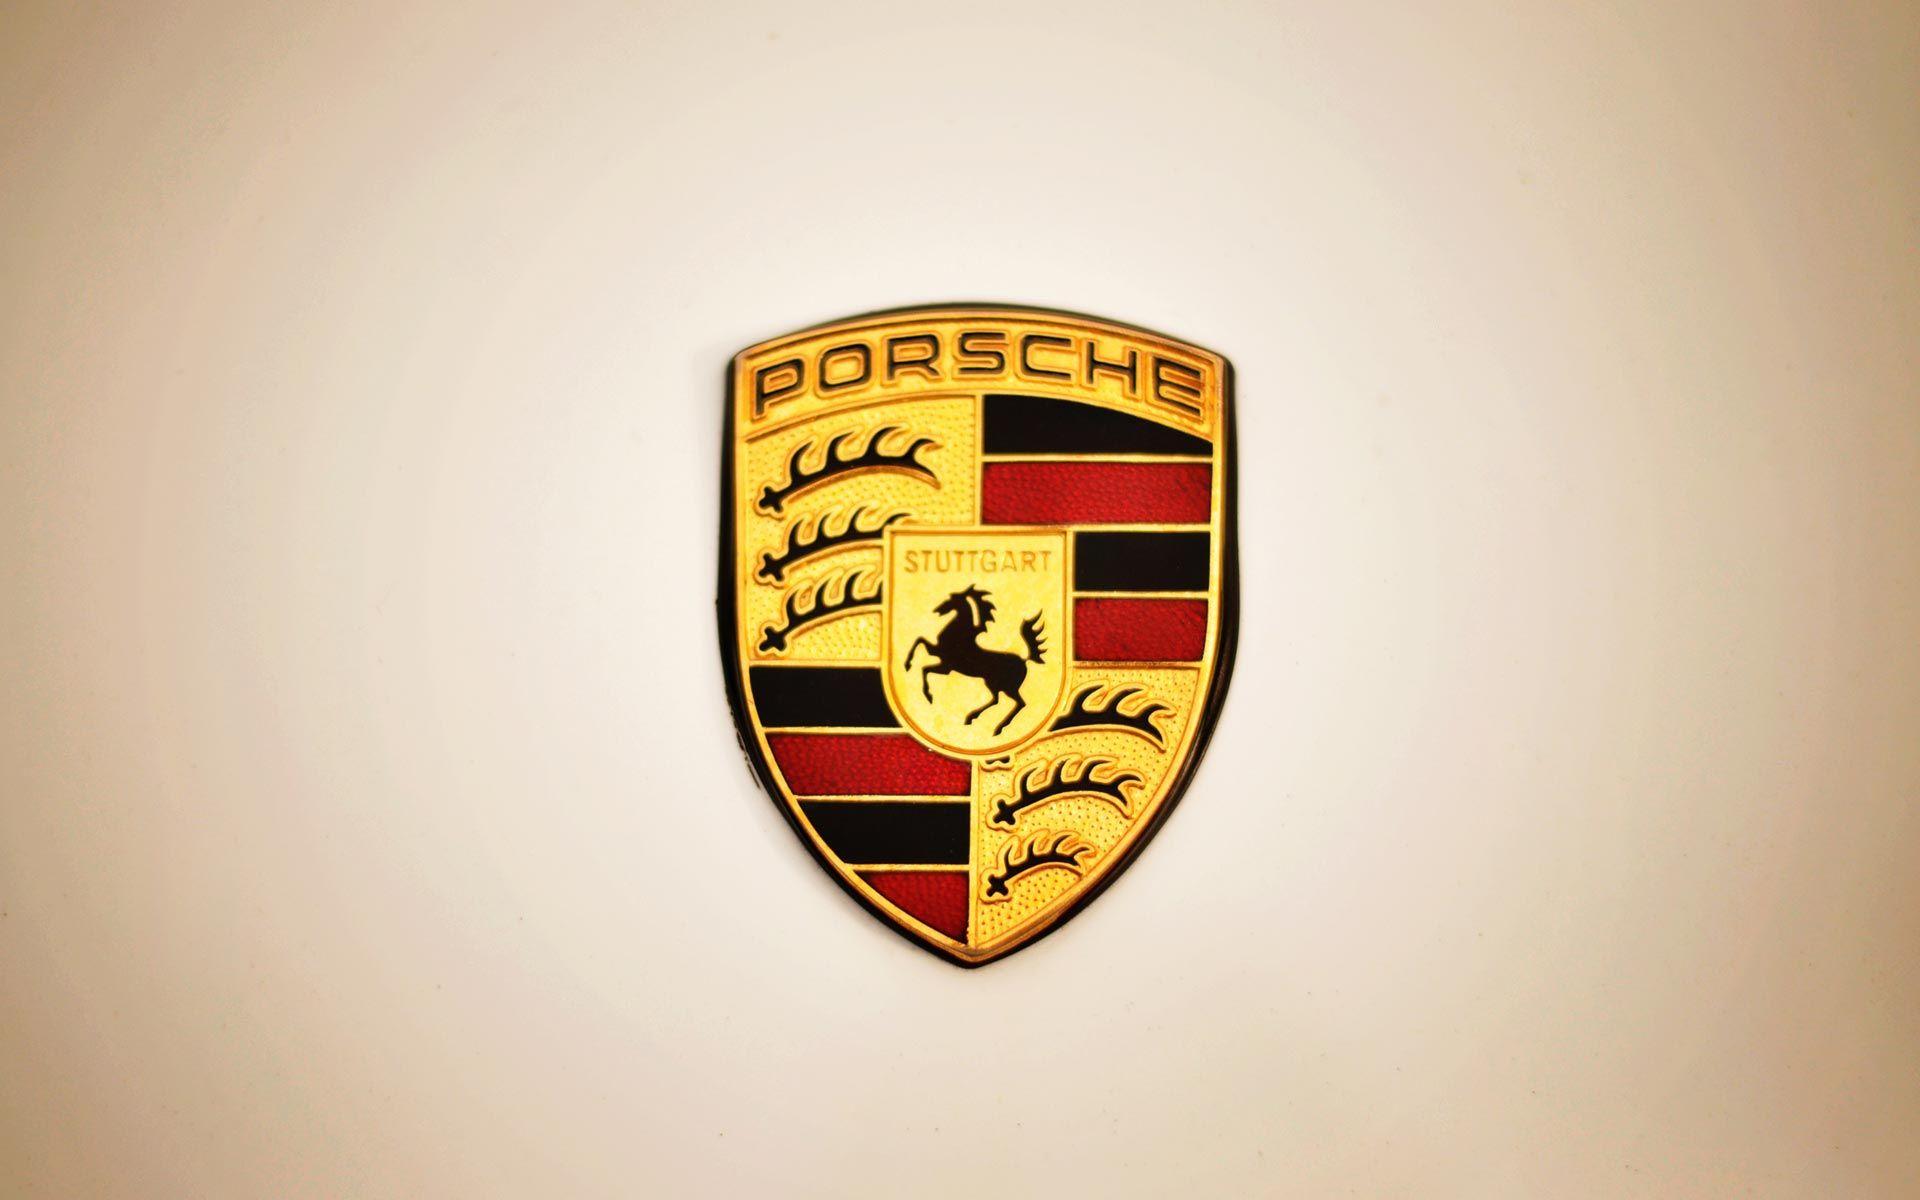 Porsche Logo Hd 41458 2560x1440 Px Car Brands Logos Luxury Car